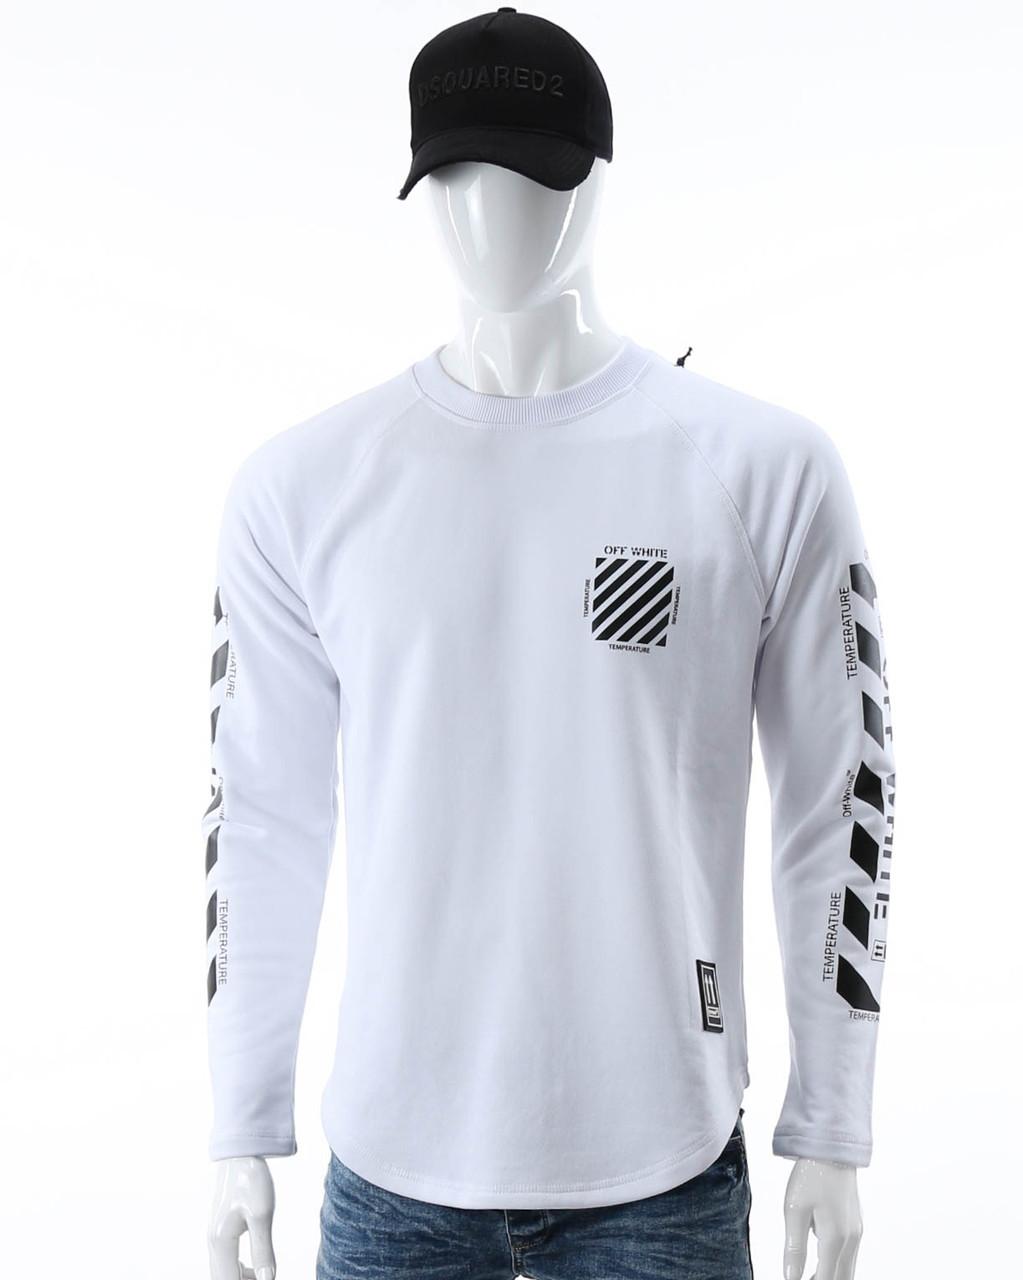 Свитшот белый OFF-WHITE №6, рис на рукавах WHT L(Р) 20-518-201-003